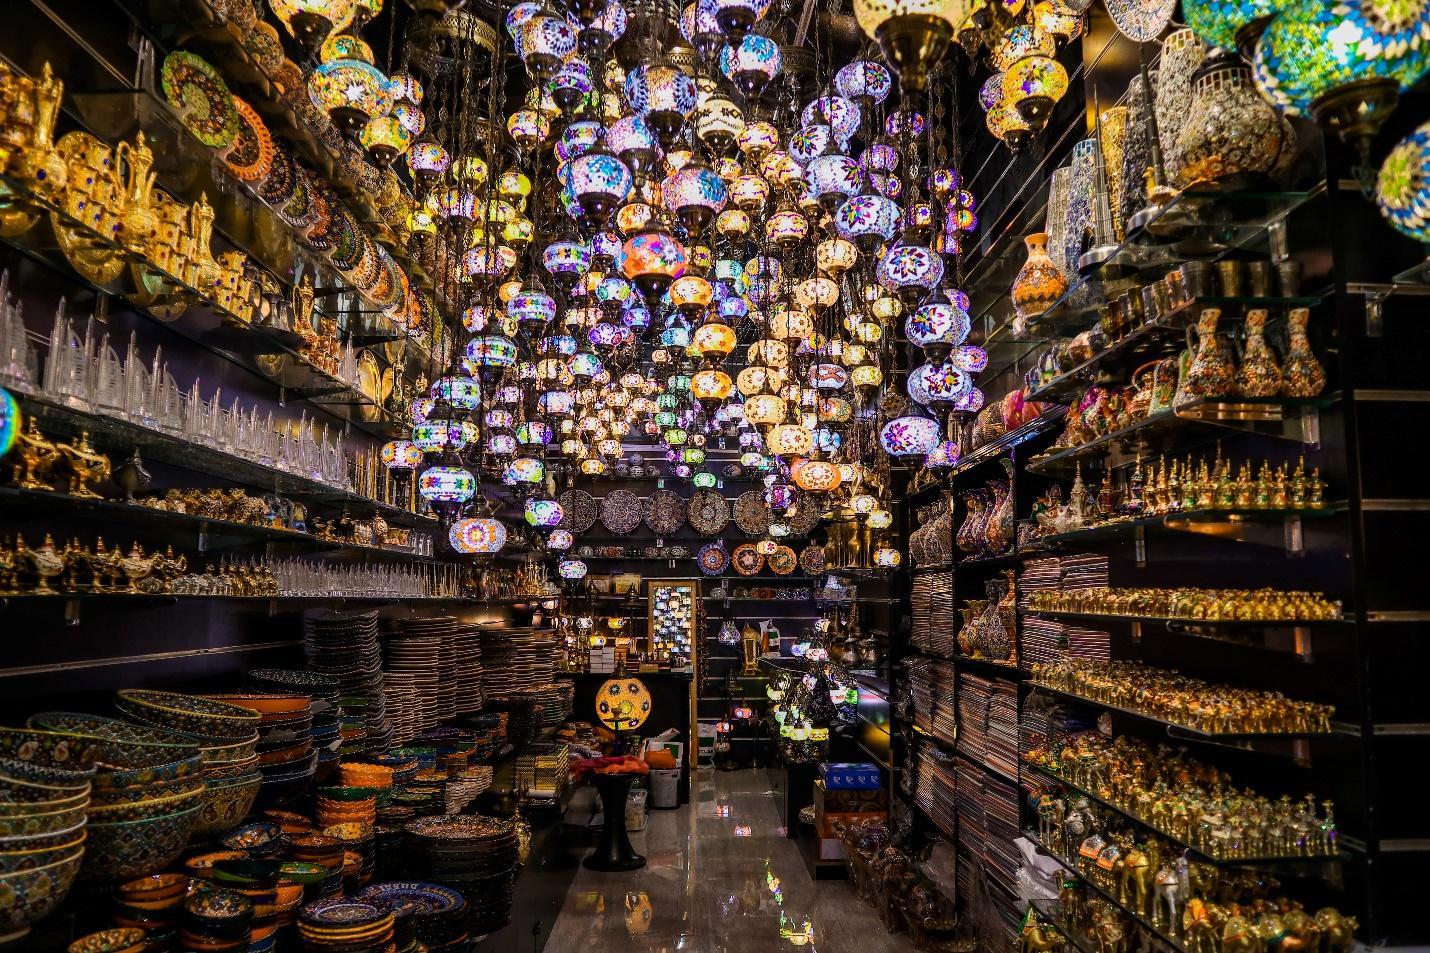 C:\Users\Shrutika Yadav\Downloads\dubai-shopping-festival.jpg